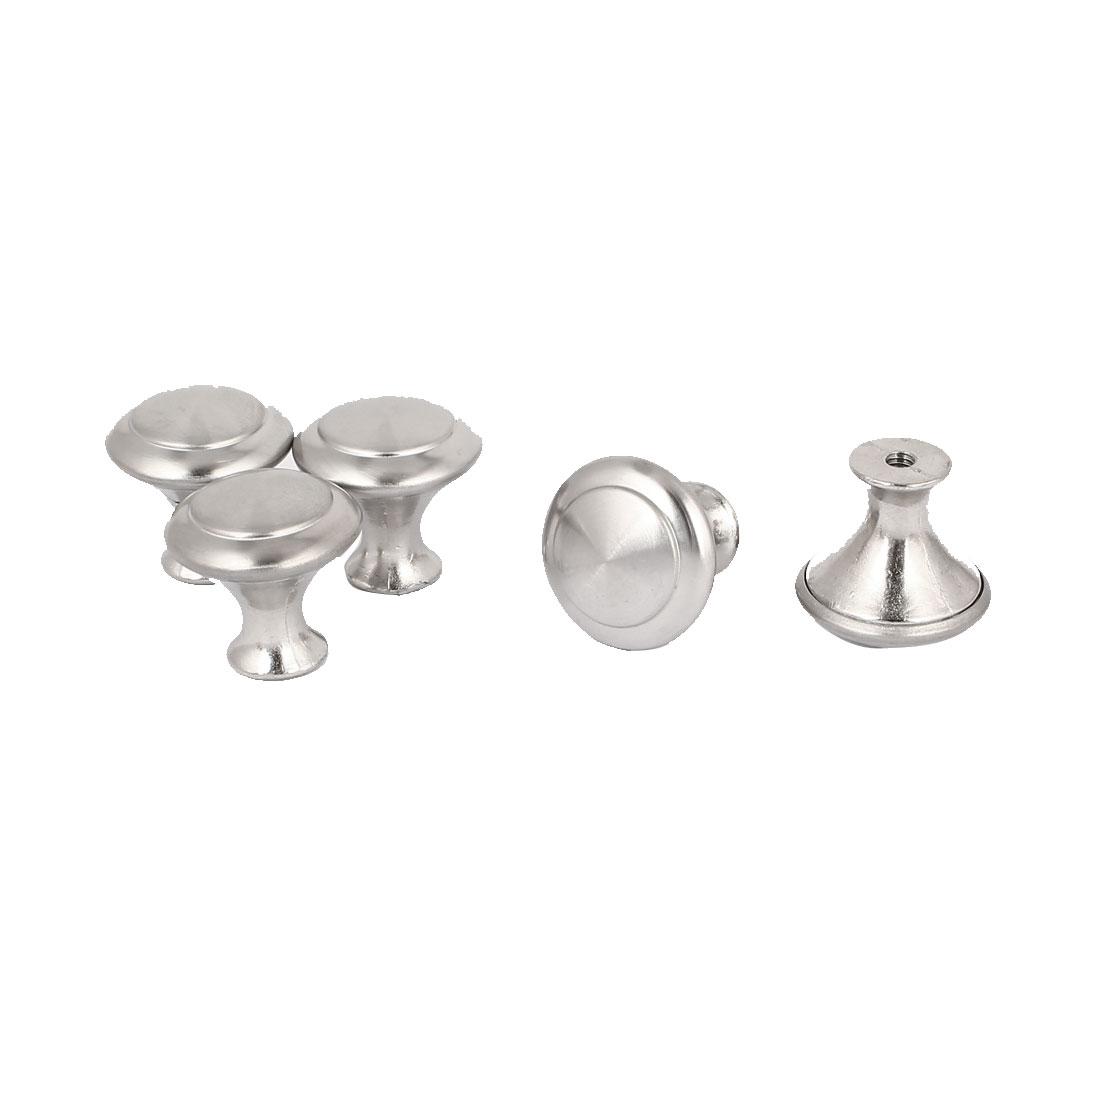 Kitchen Cabinet Dresser Mushroom Shape Pull Knob Hardware 5pcs